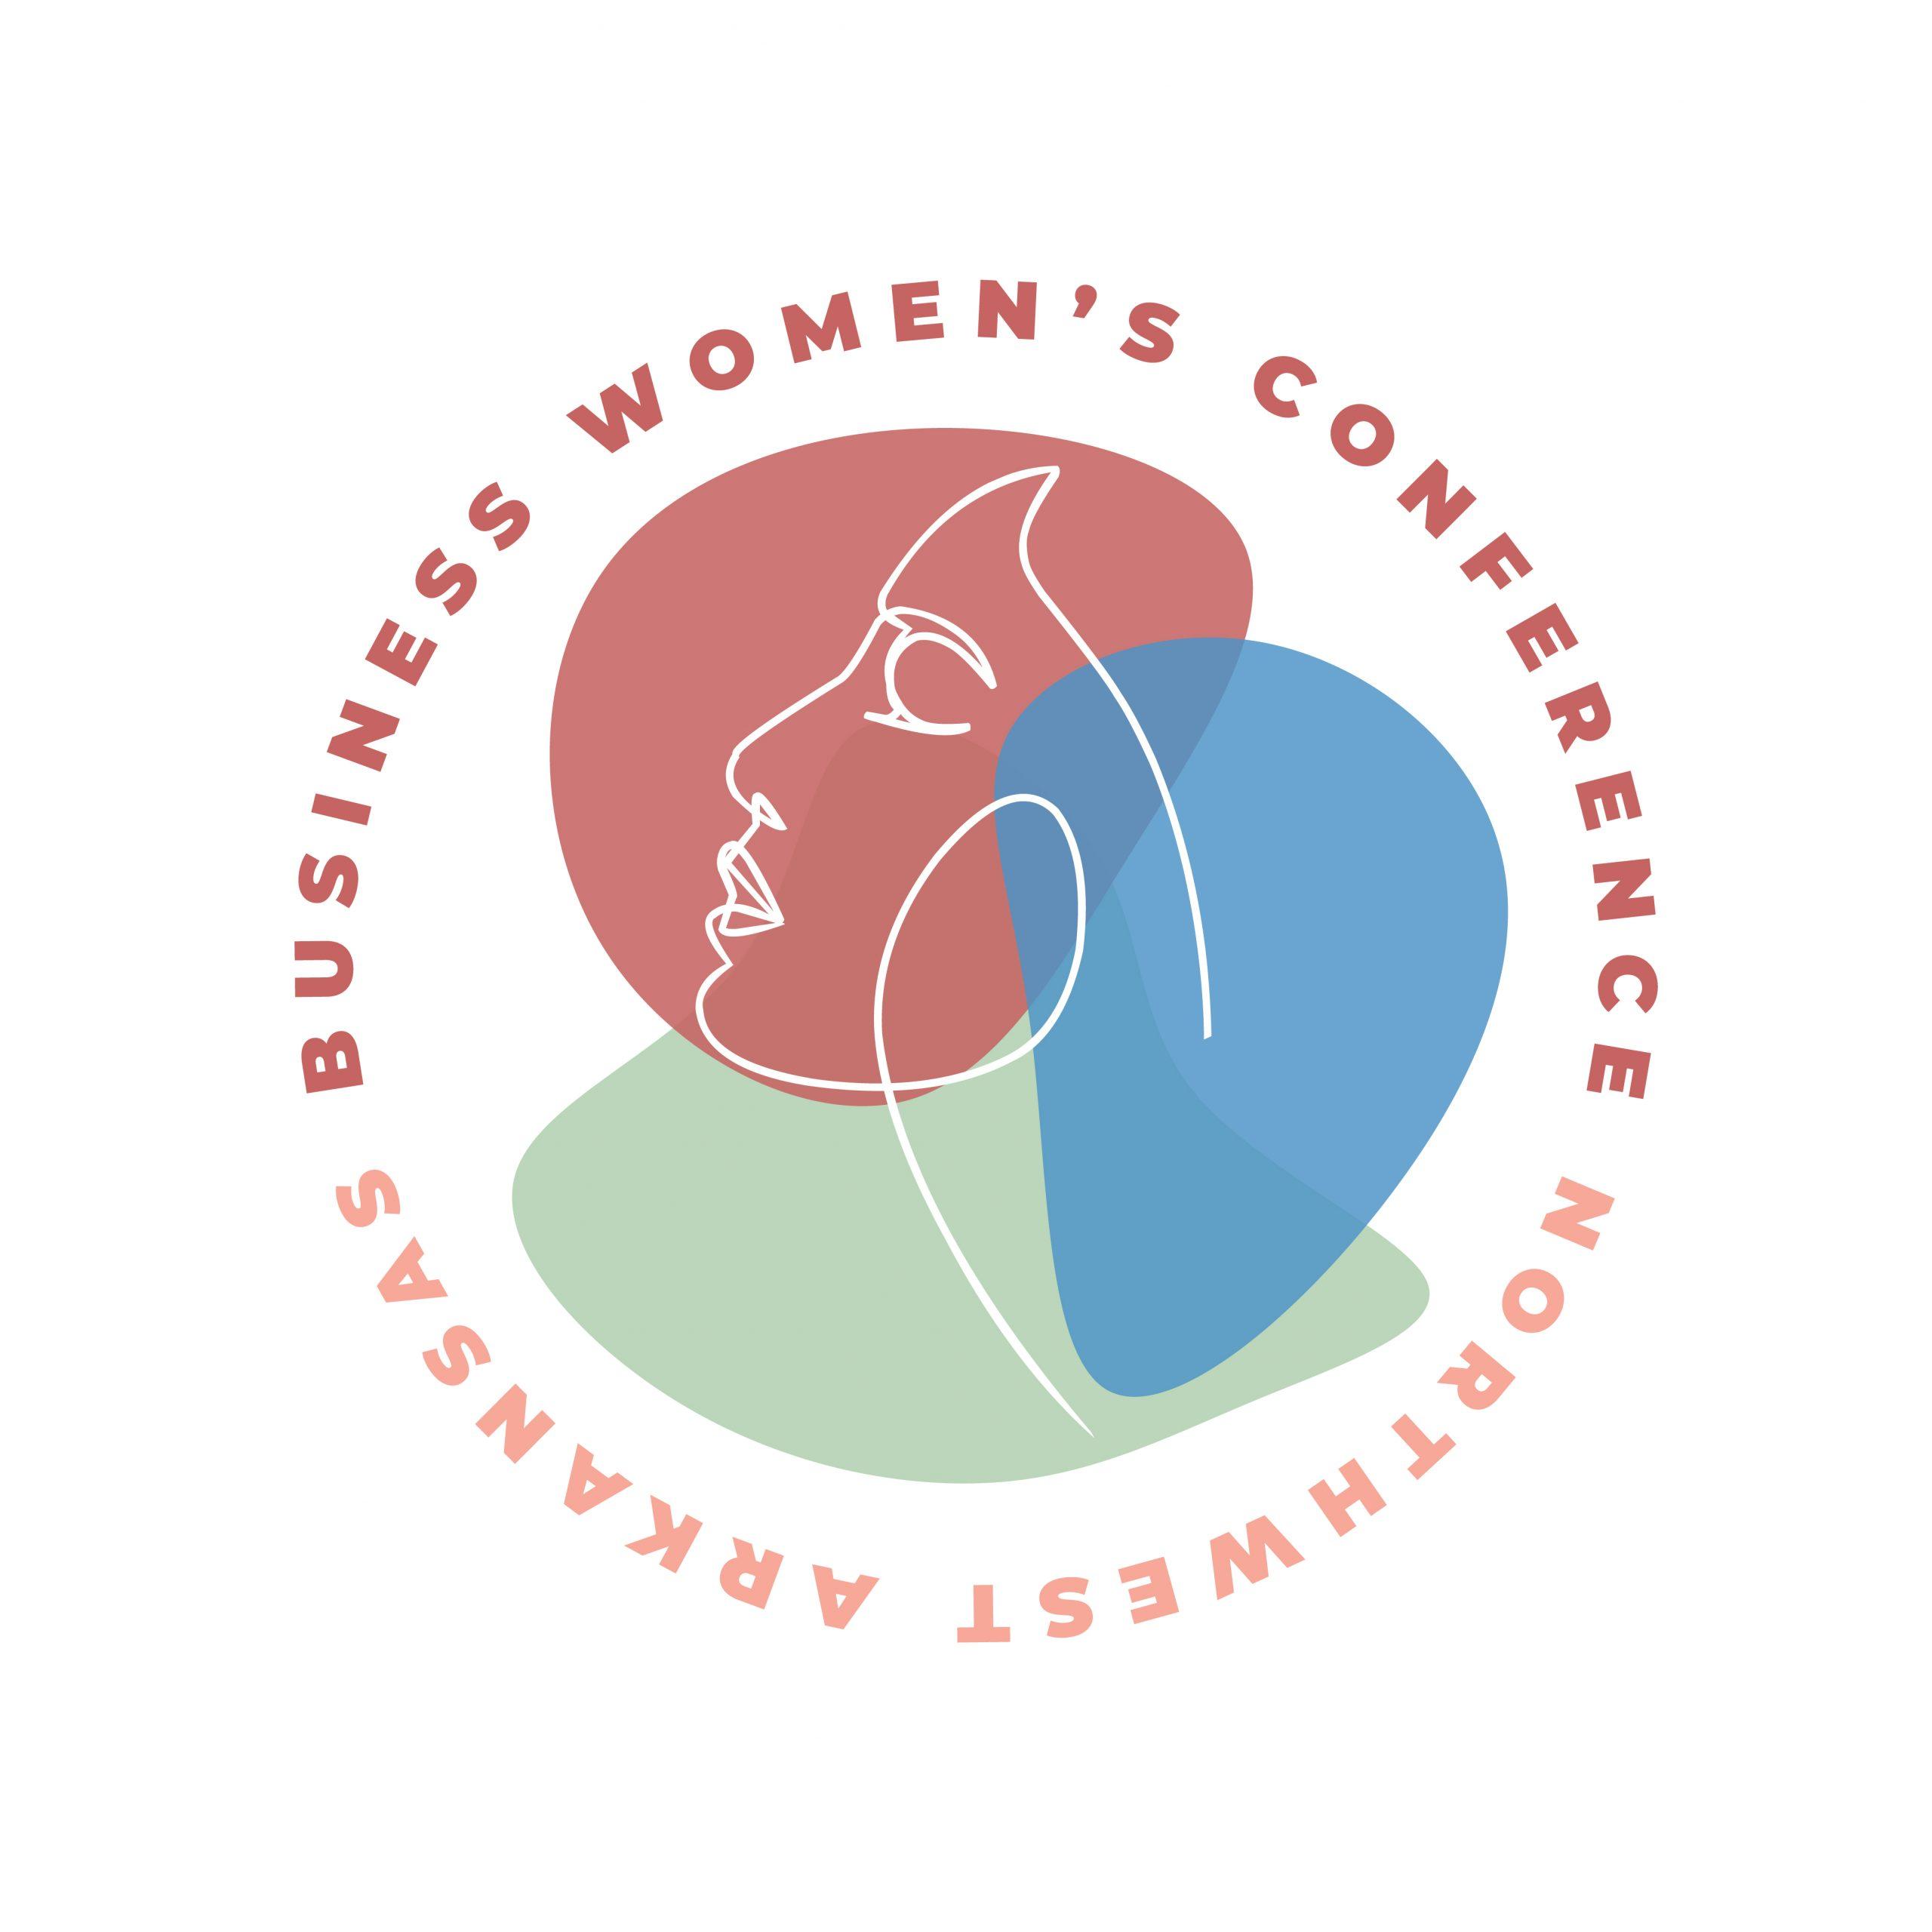 Northwest Arkansas Business Women's Conference: Sept. 13-15, 2021